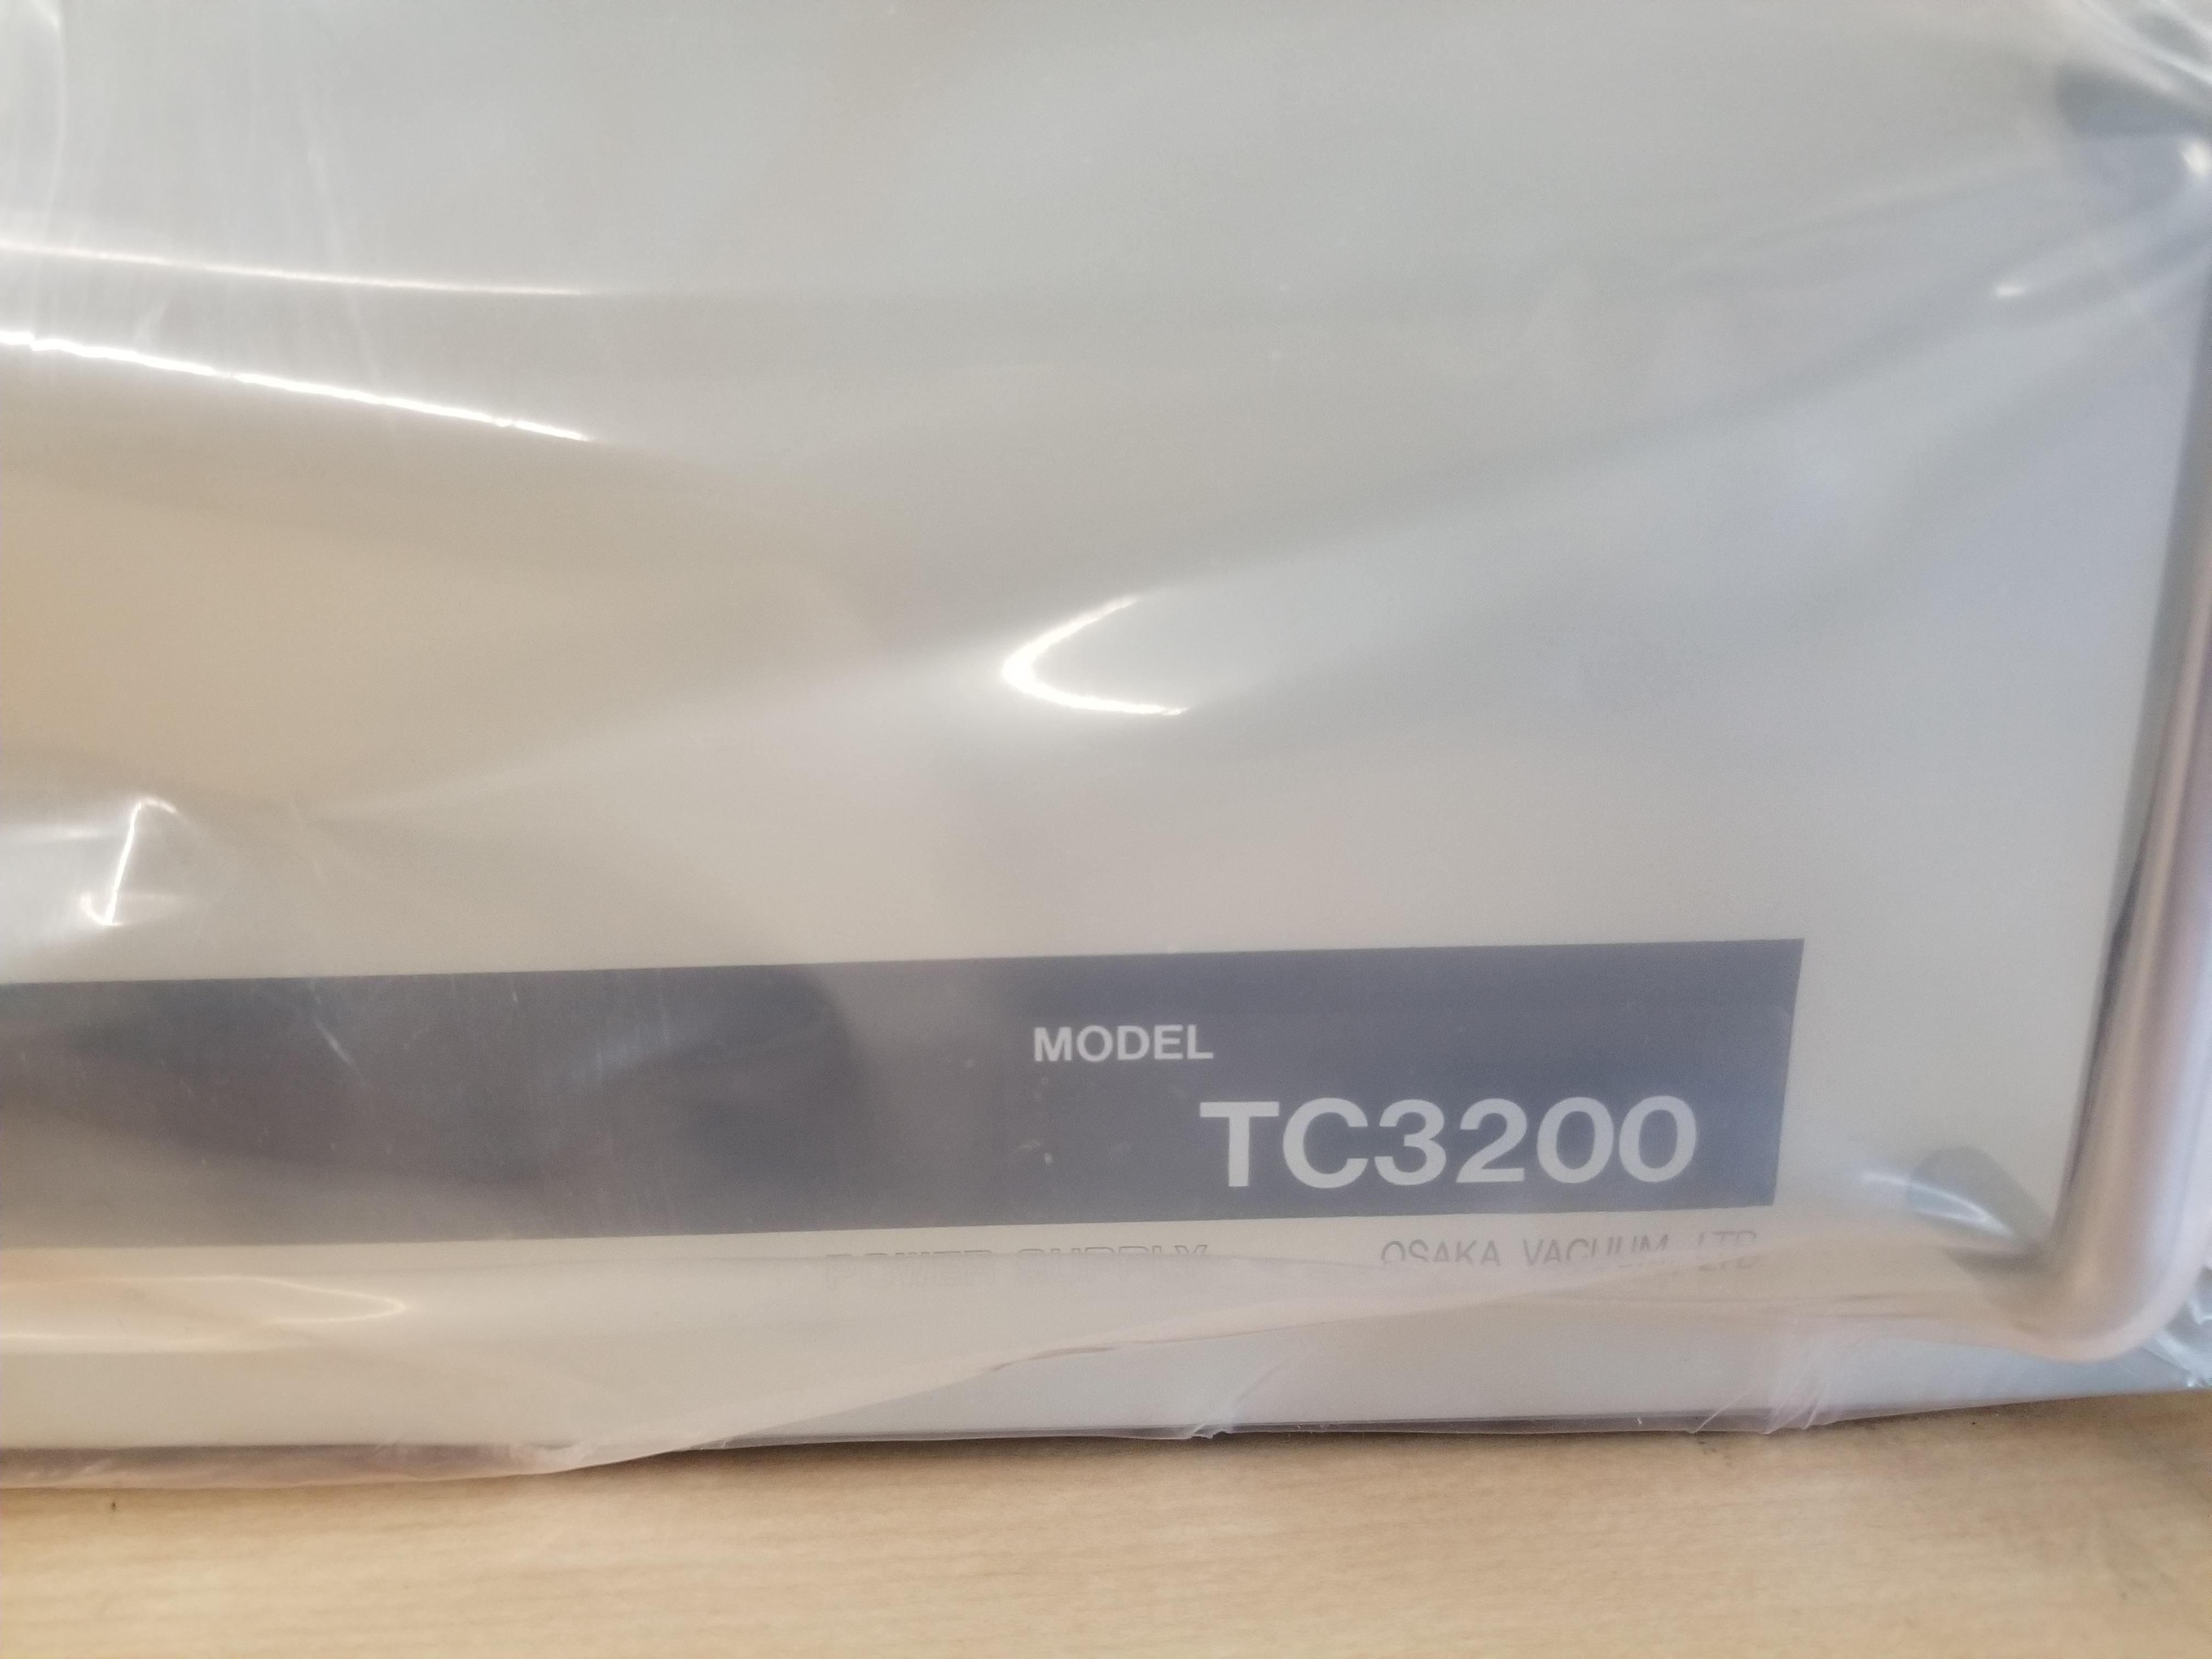 New Osaka TurboMolecular Turbo Vacuum Pump Power Supply TC3200 - Image 6 of 10